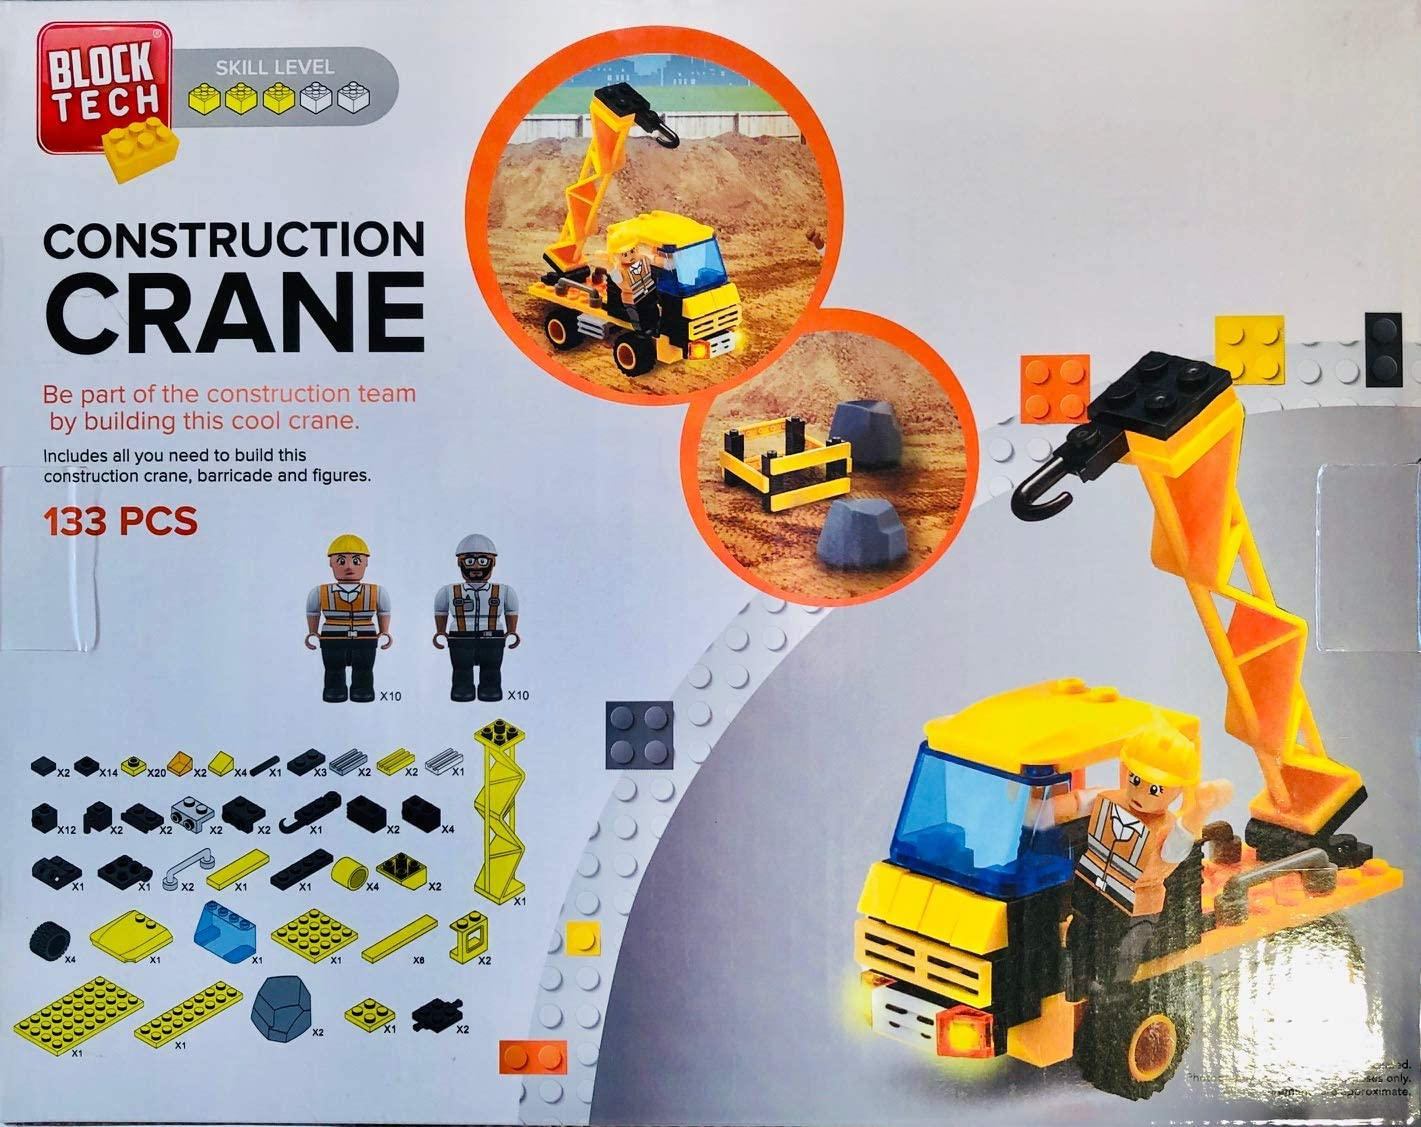 Block Tech Construction Crane